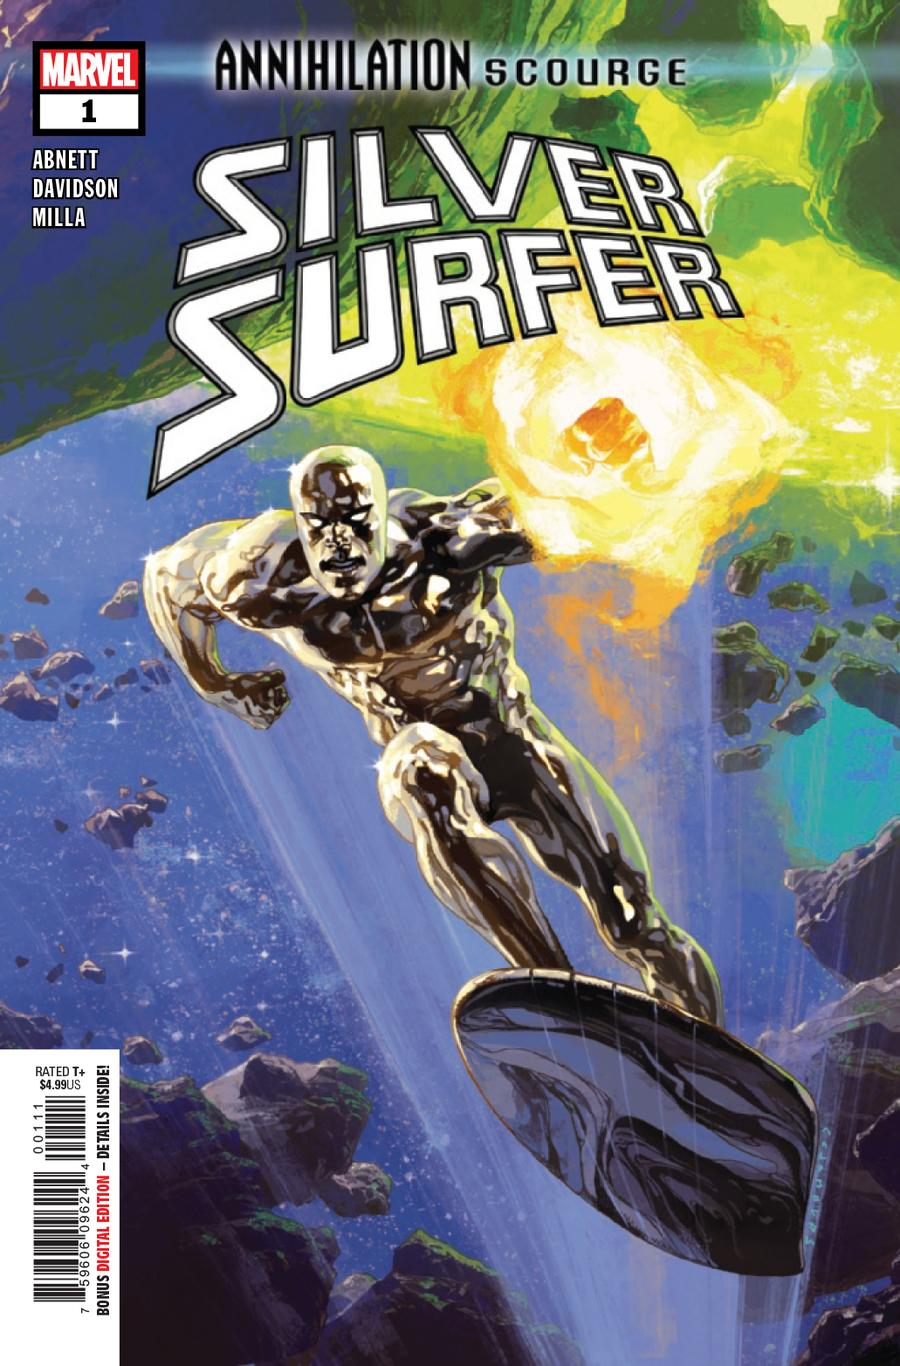 Annihilation Scourge Silver Surfer #1 Cover A Regular Josemaria Casanovas Cover